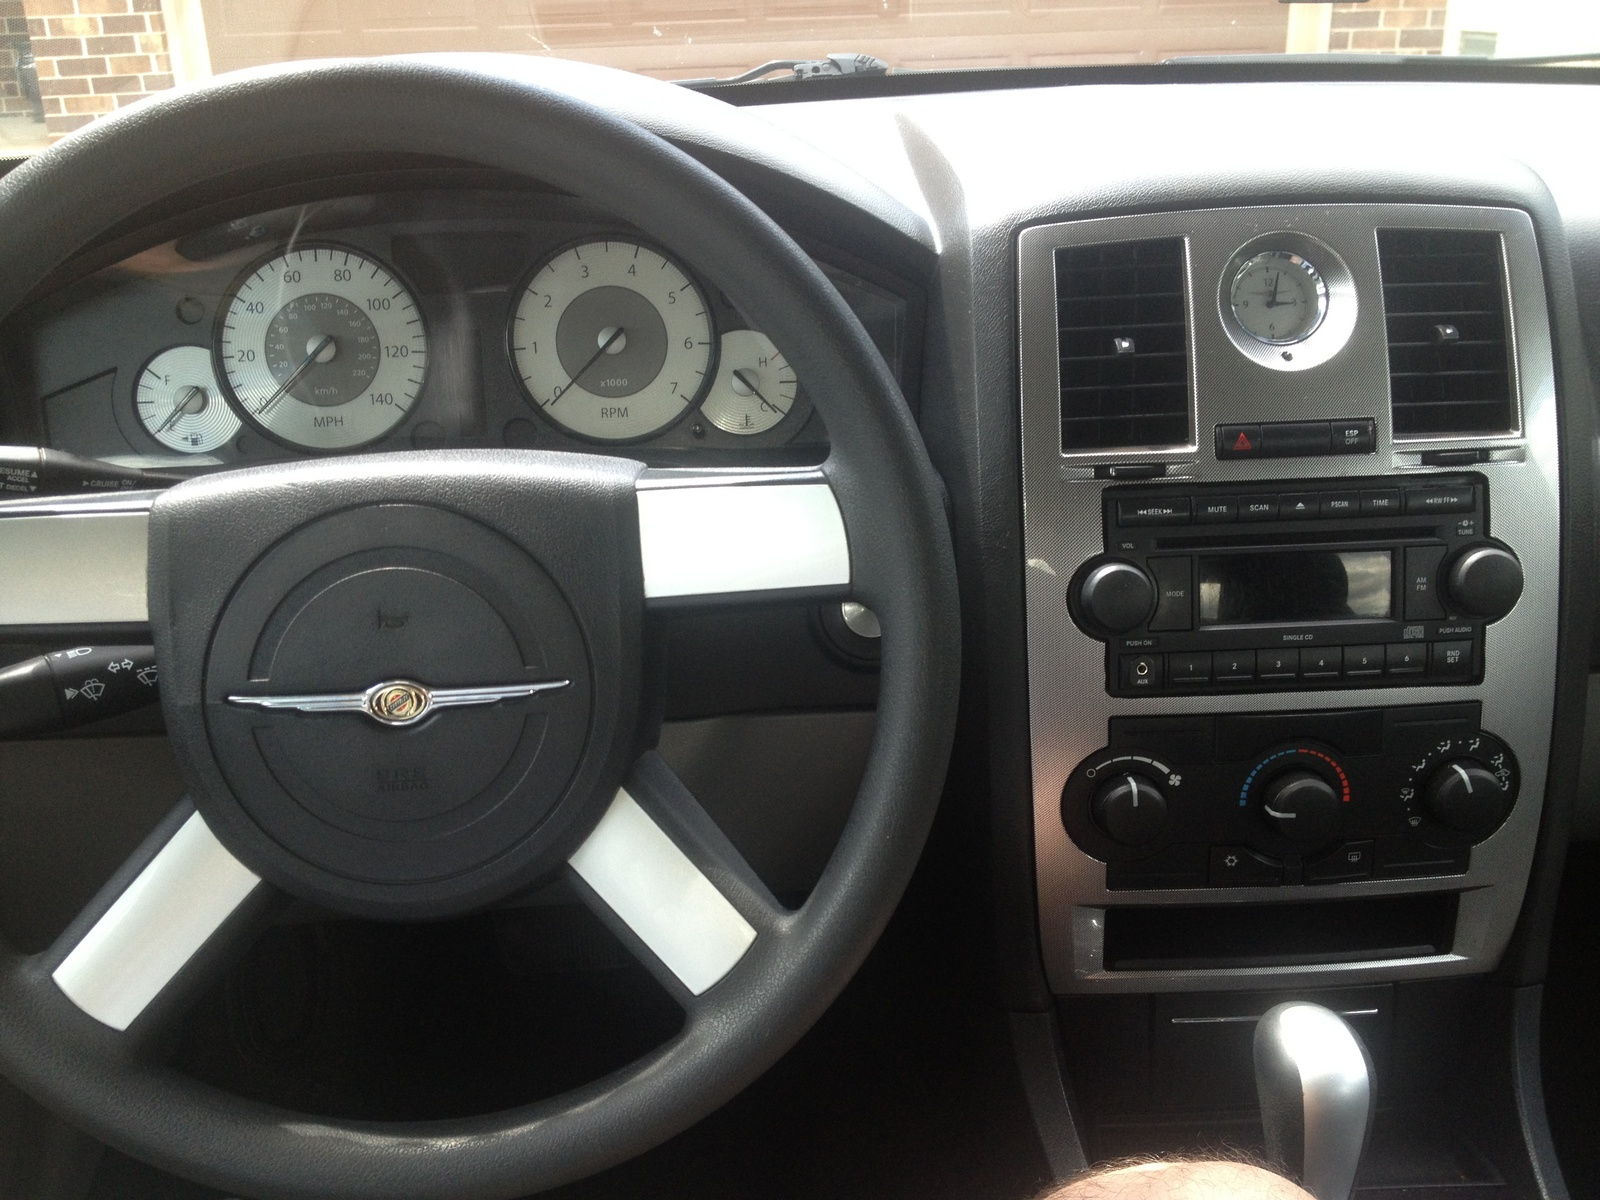 Dodge Dealers Near Me >> 2007 Chrysler 300 - Interior Pictures - CarGurus